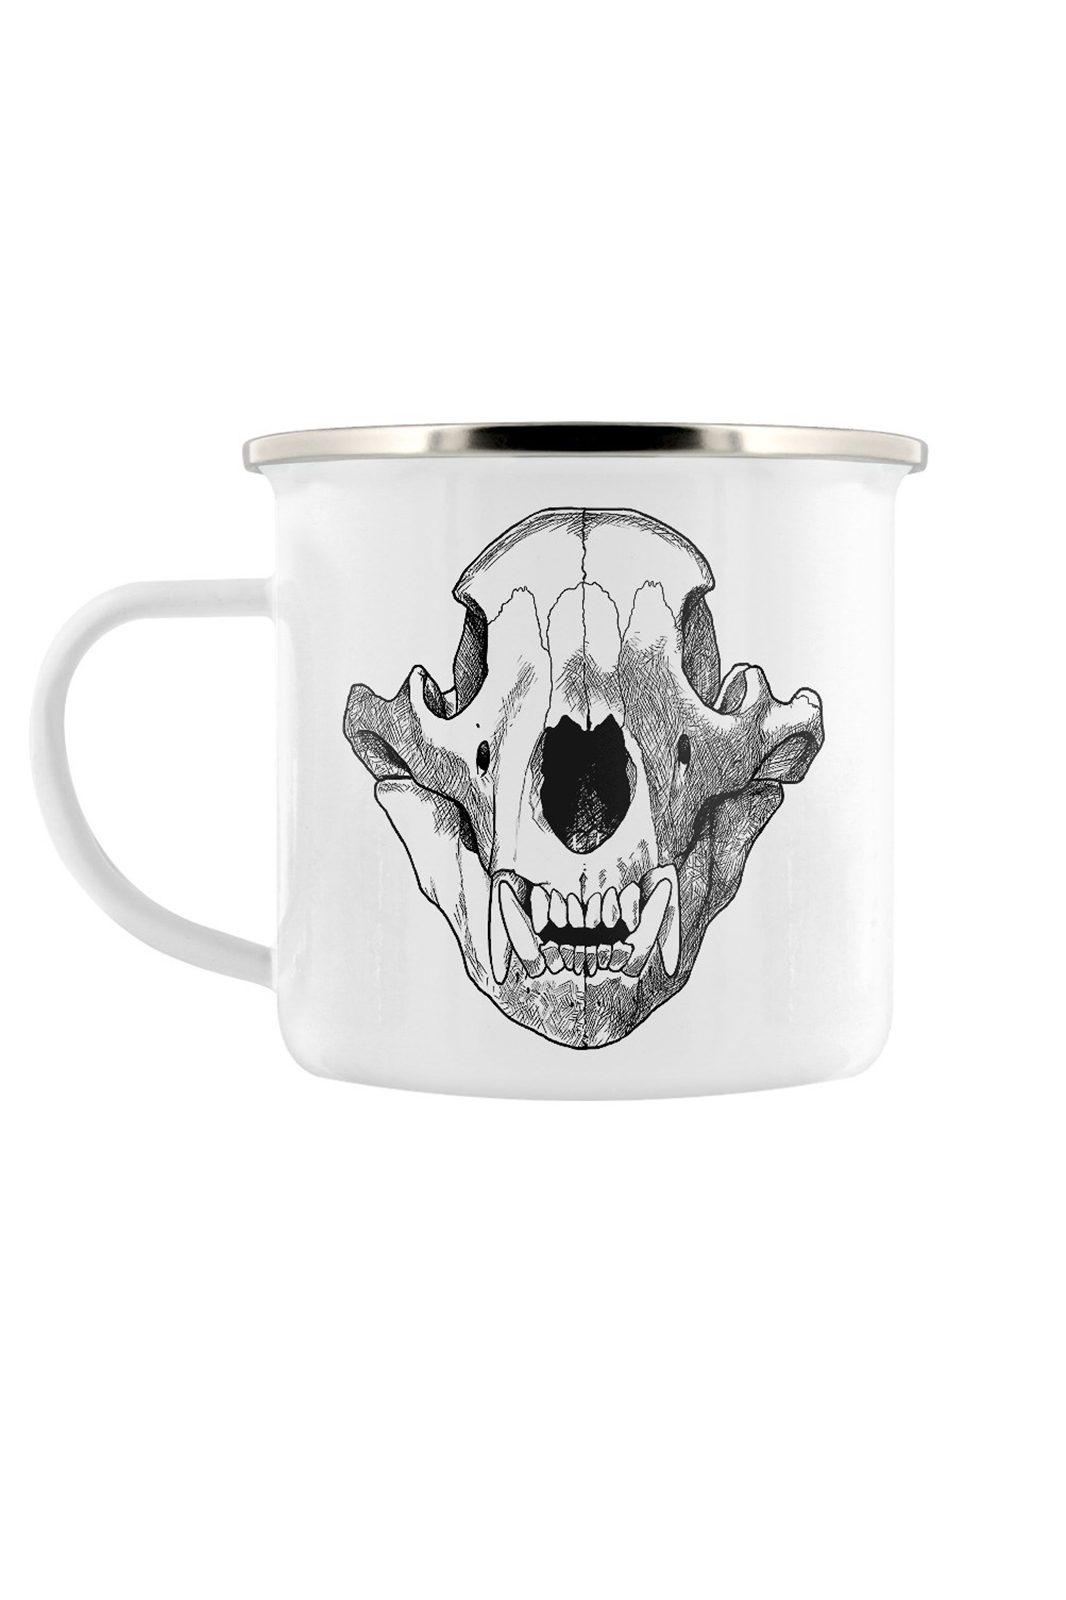 Ursa Skull Enamel Mug